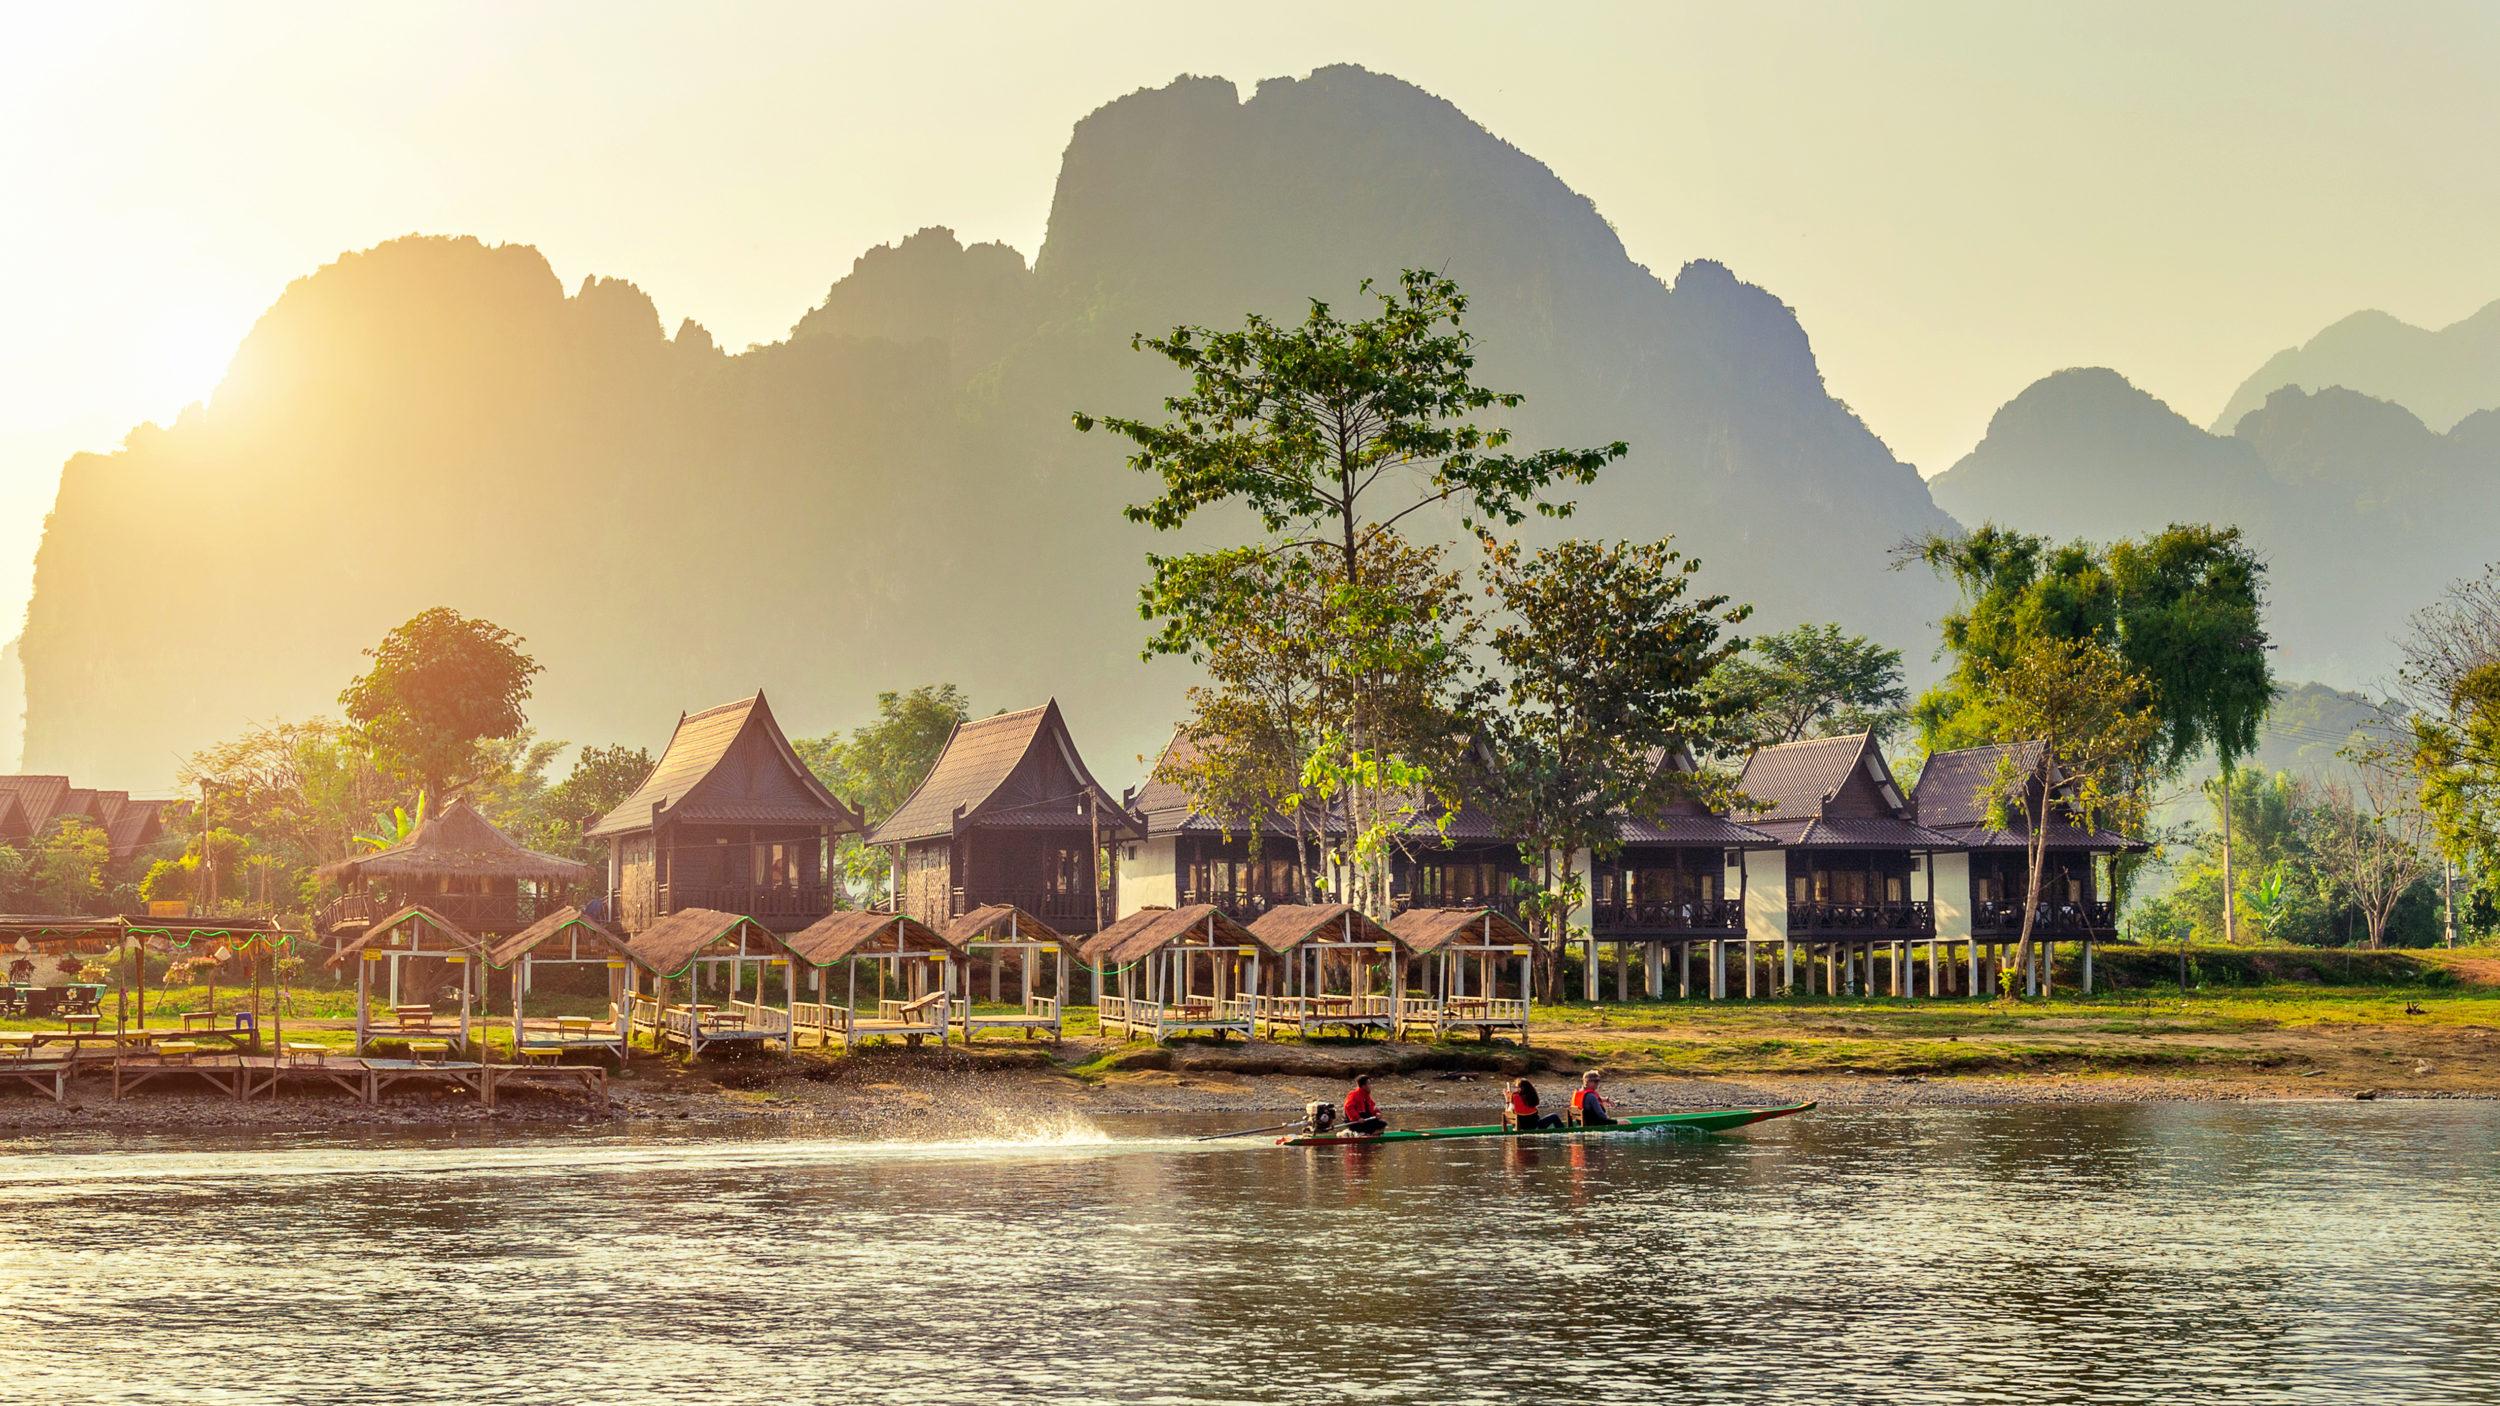 Laos [Shutterstock]